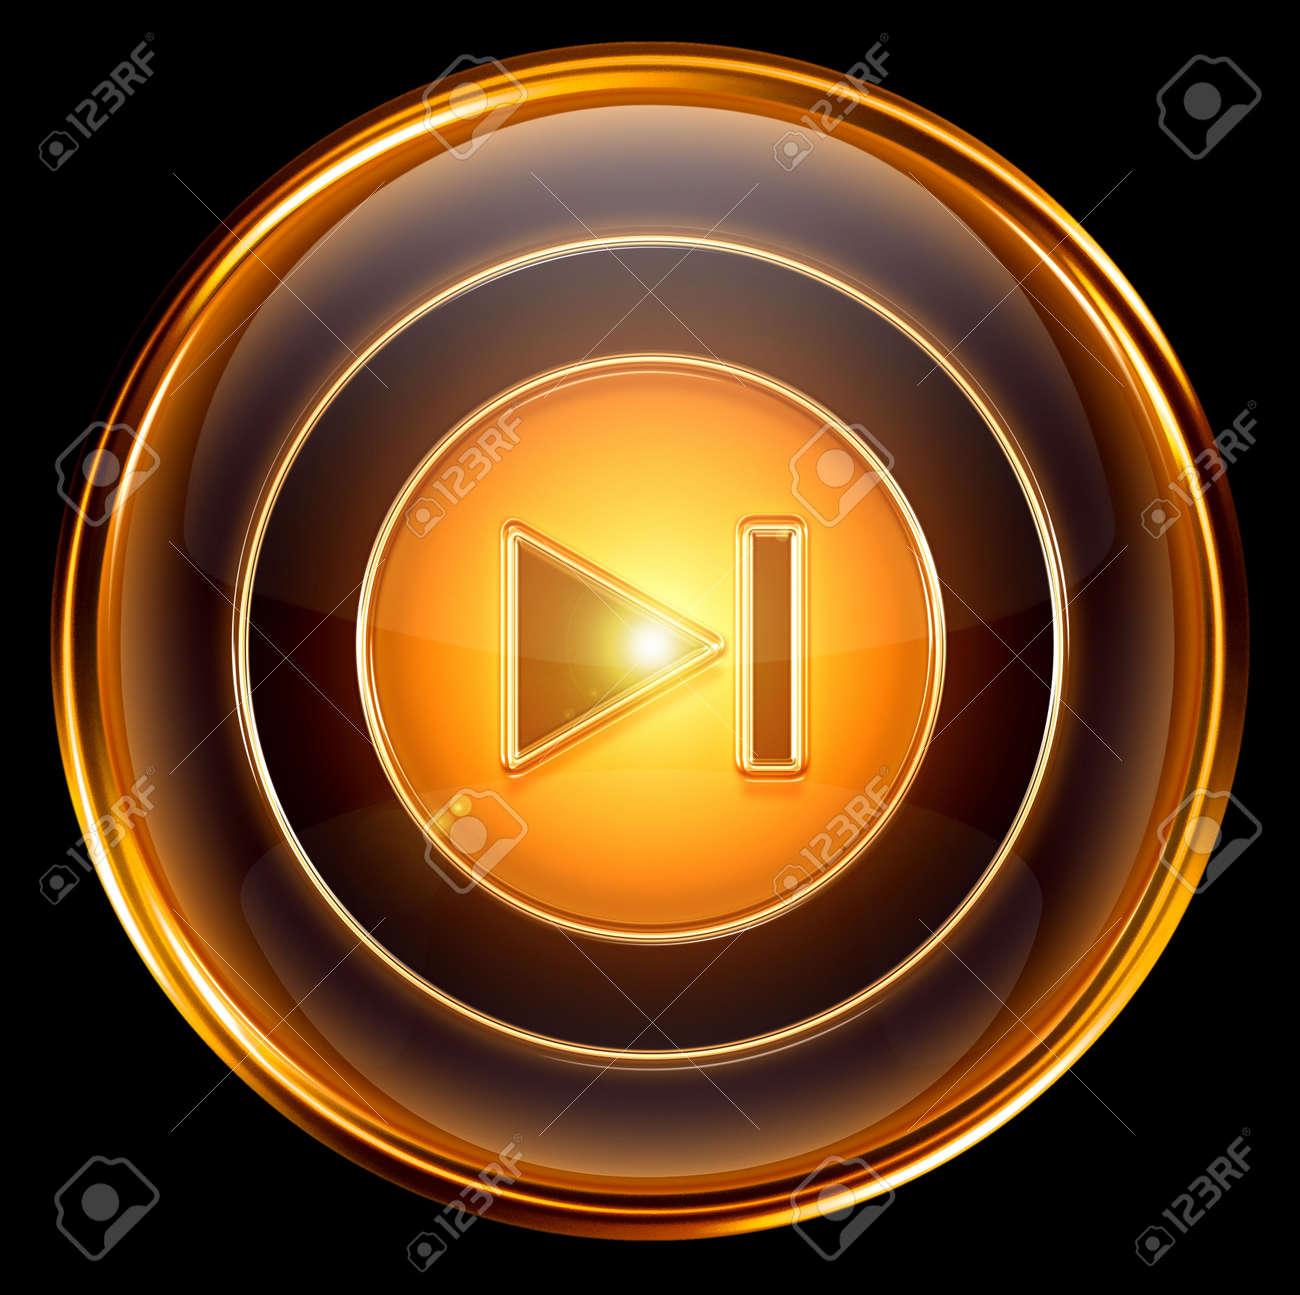 Rewind Forward icon gold, isolated on black background Stock Photo - 6173144